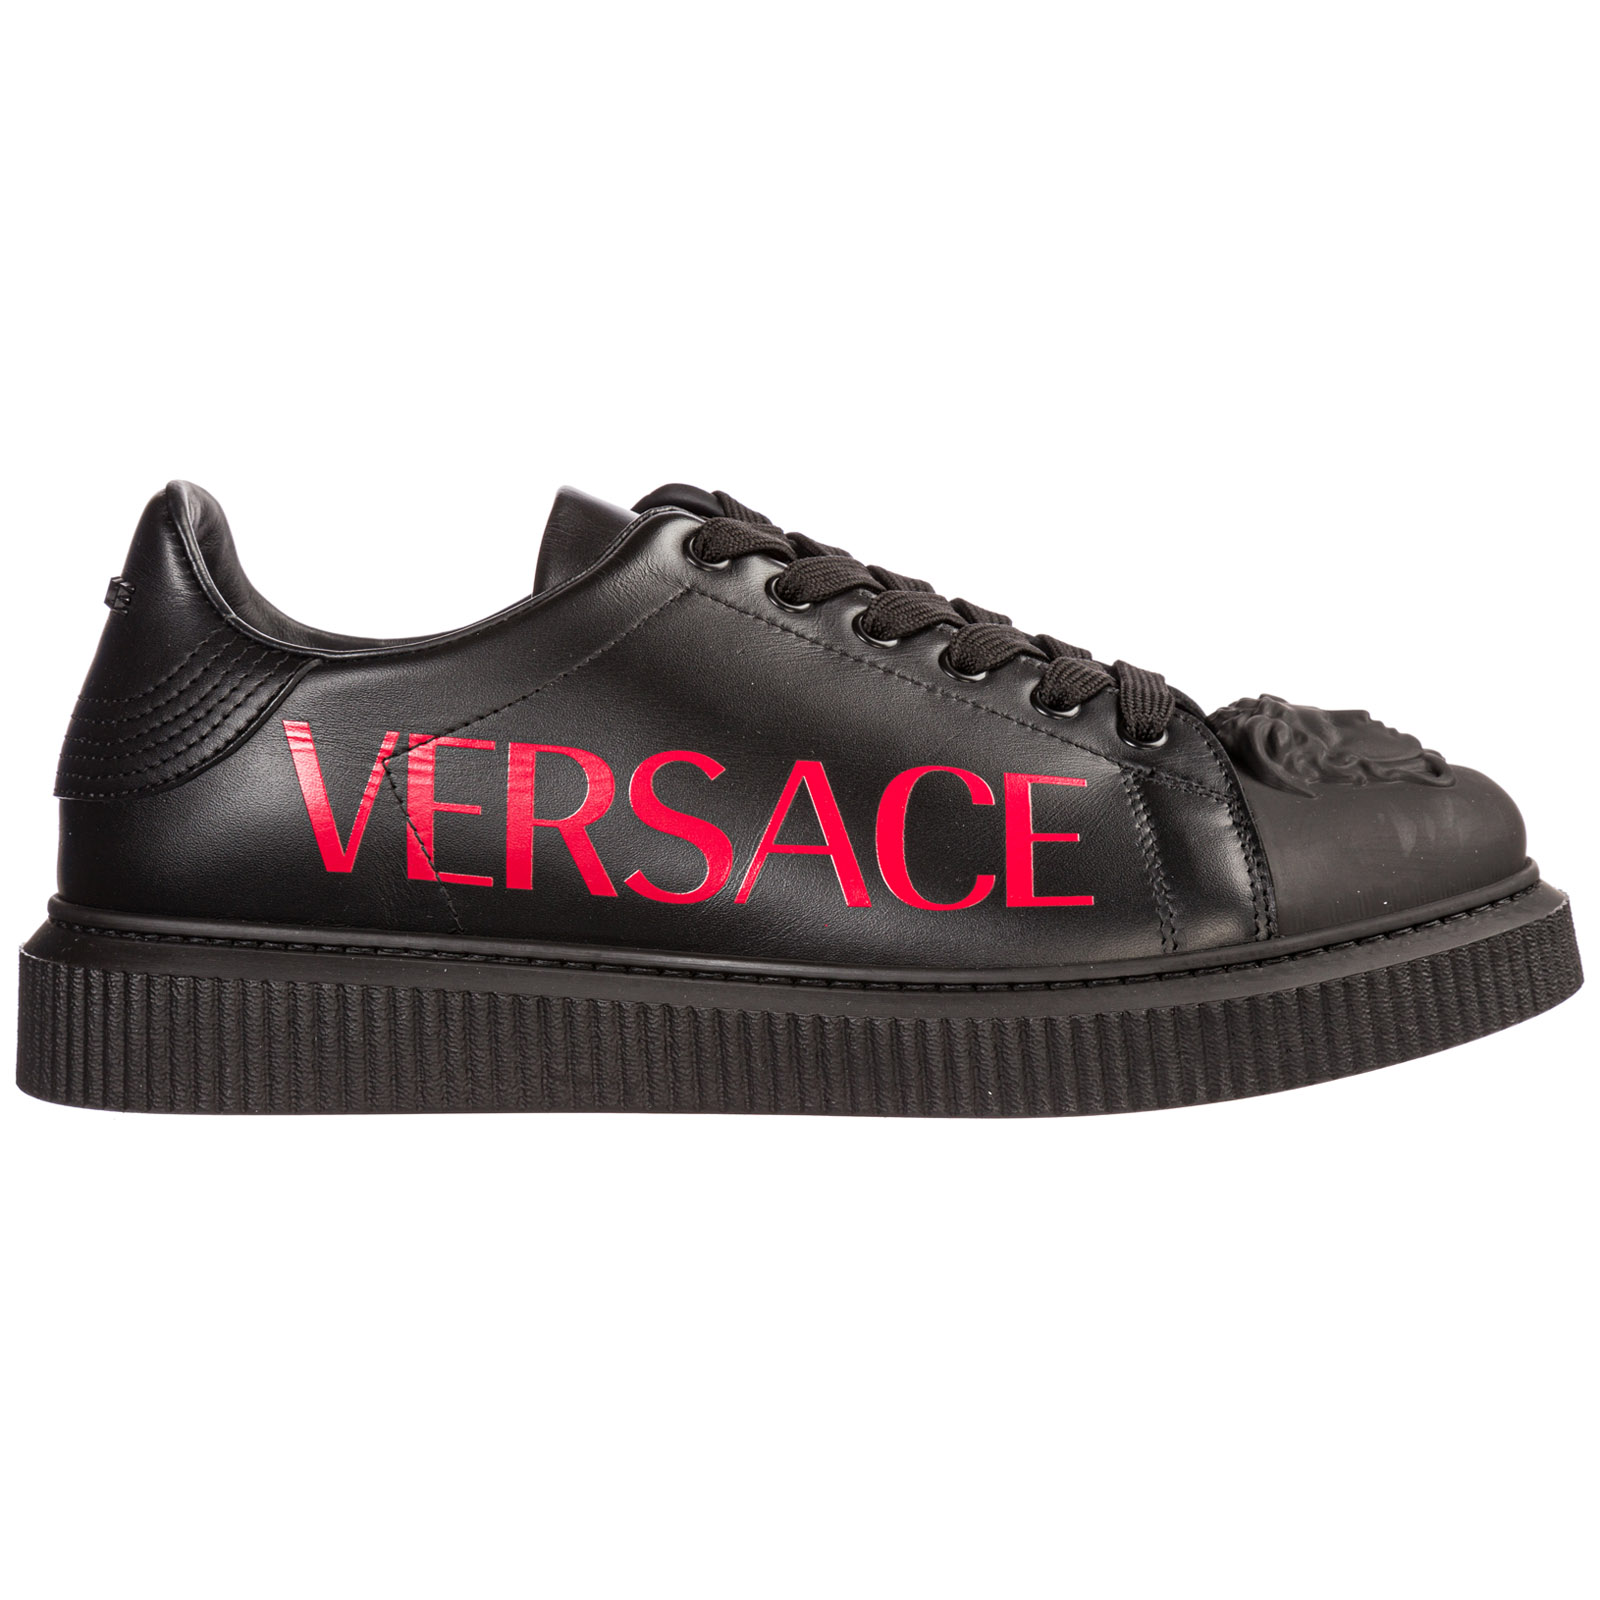 scarpe sportive 5f280 60d19 Scarpe sneakers uomo in pelle medusa